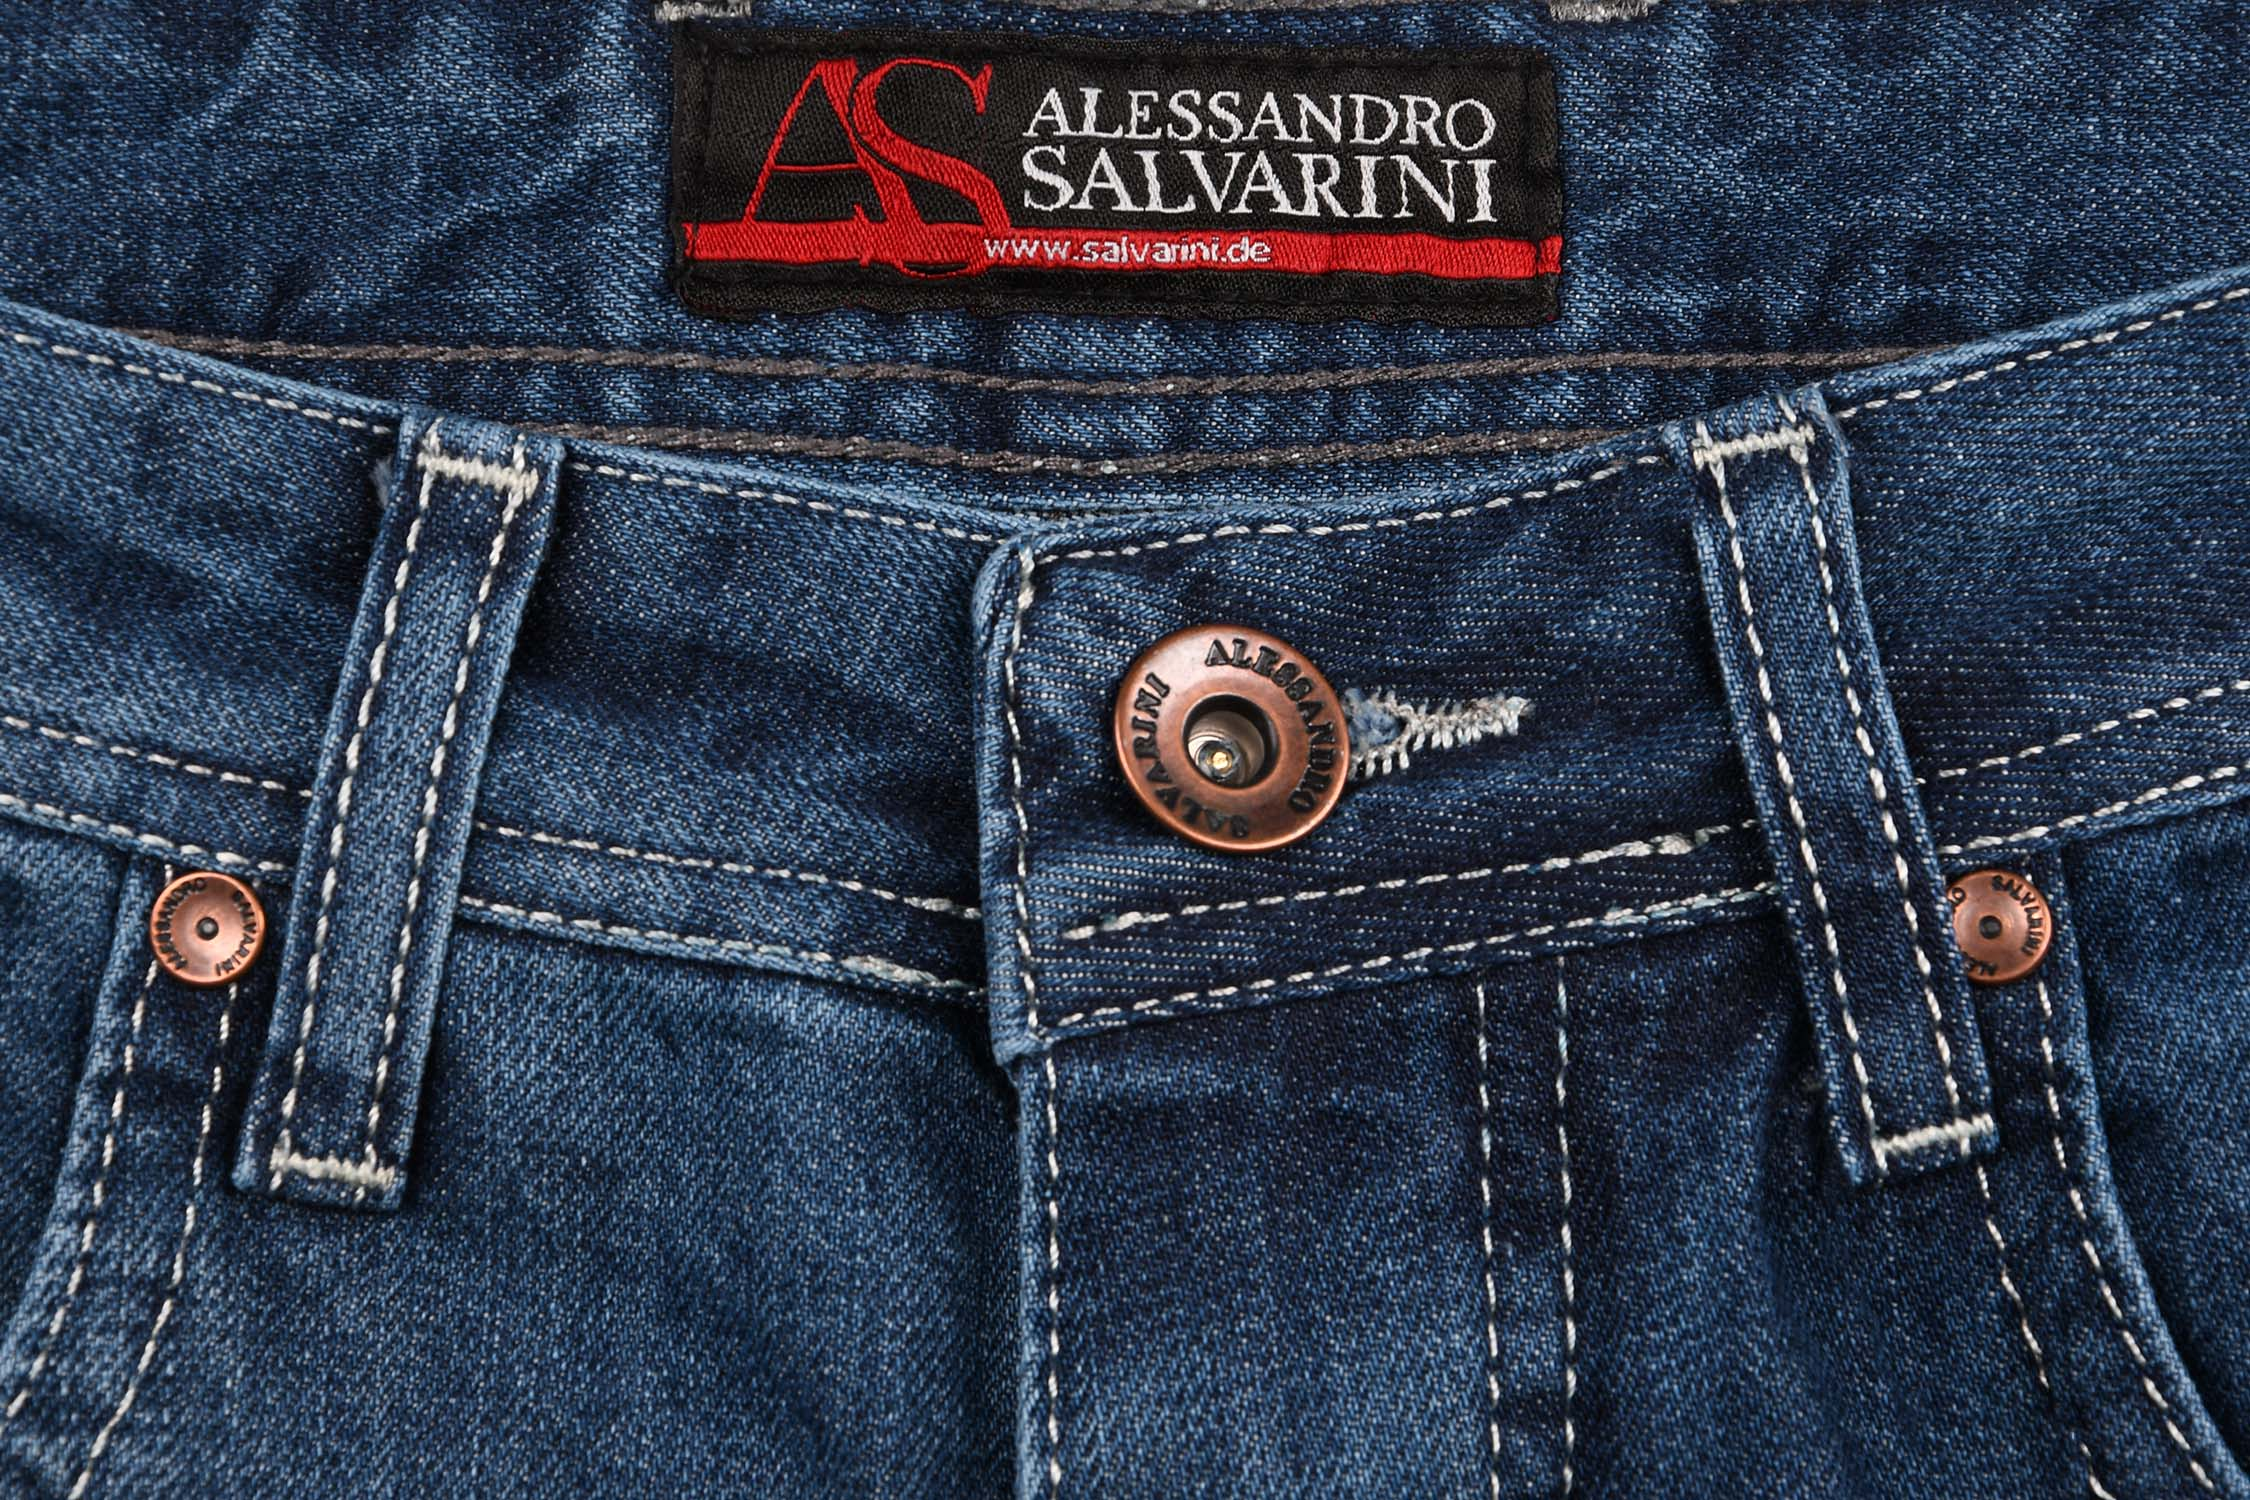 A-Salvarini-Designer-Herren-Jeans-Short-kurze-Sommer-Hose-Jeansshorts-Bermuda Indexbild 13